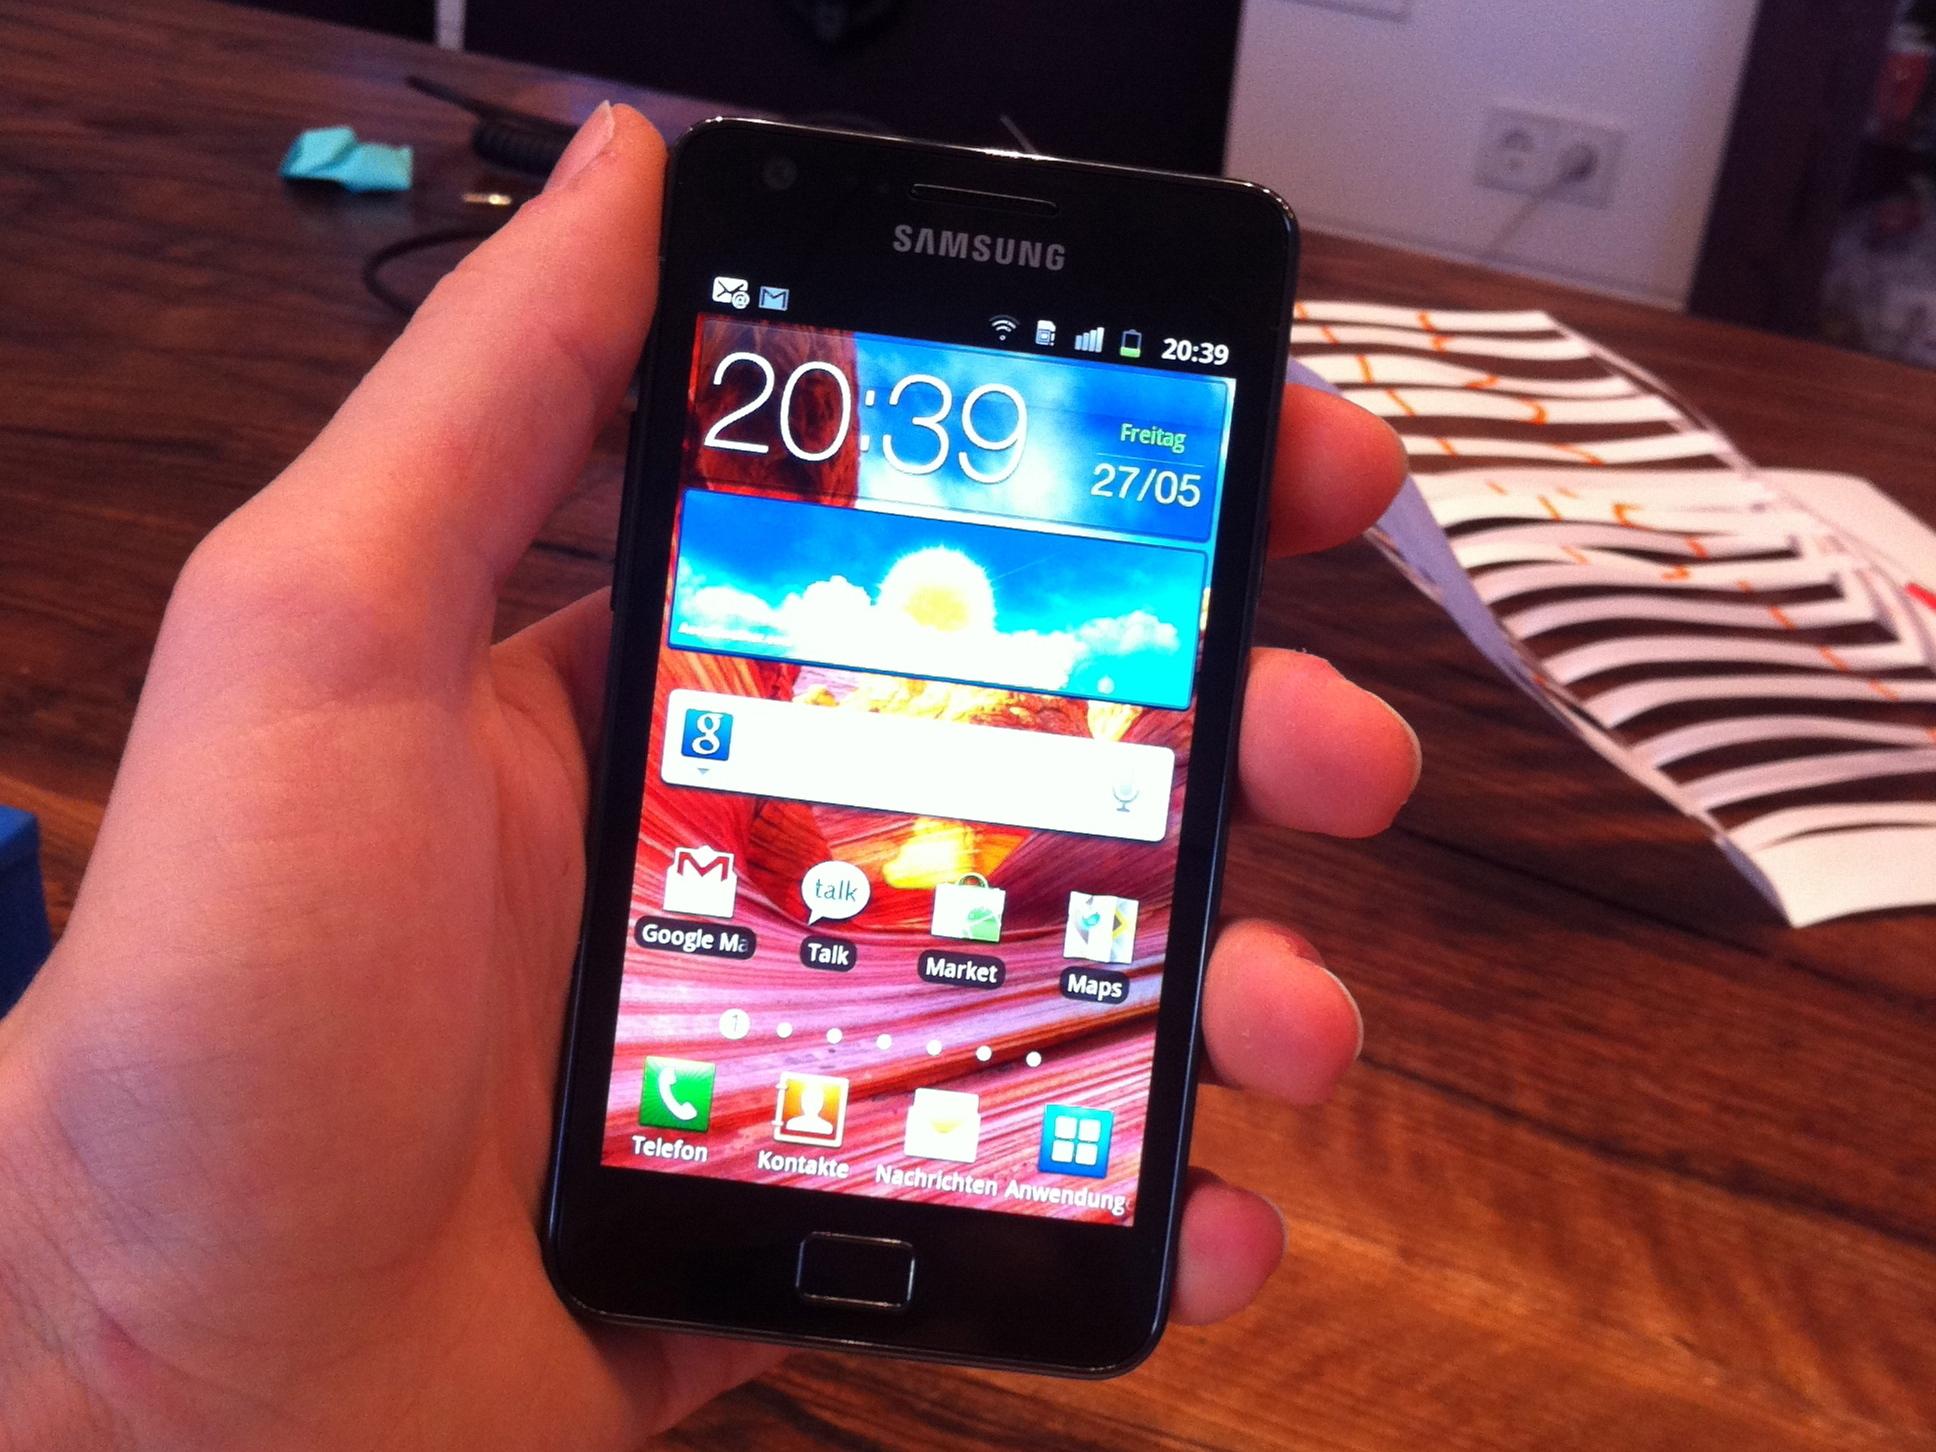 Samsung Galaxy S II Teardown